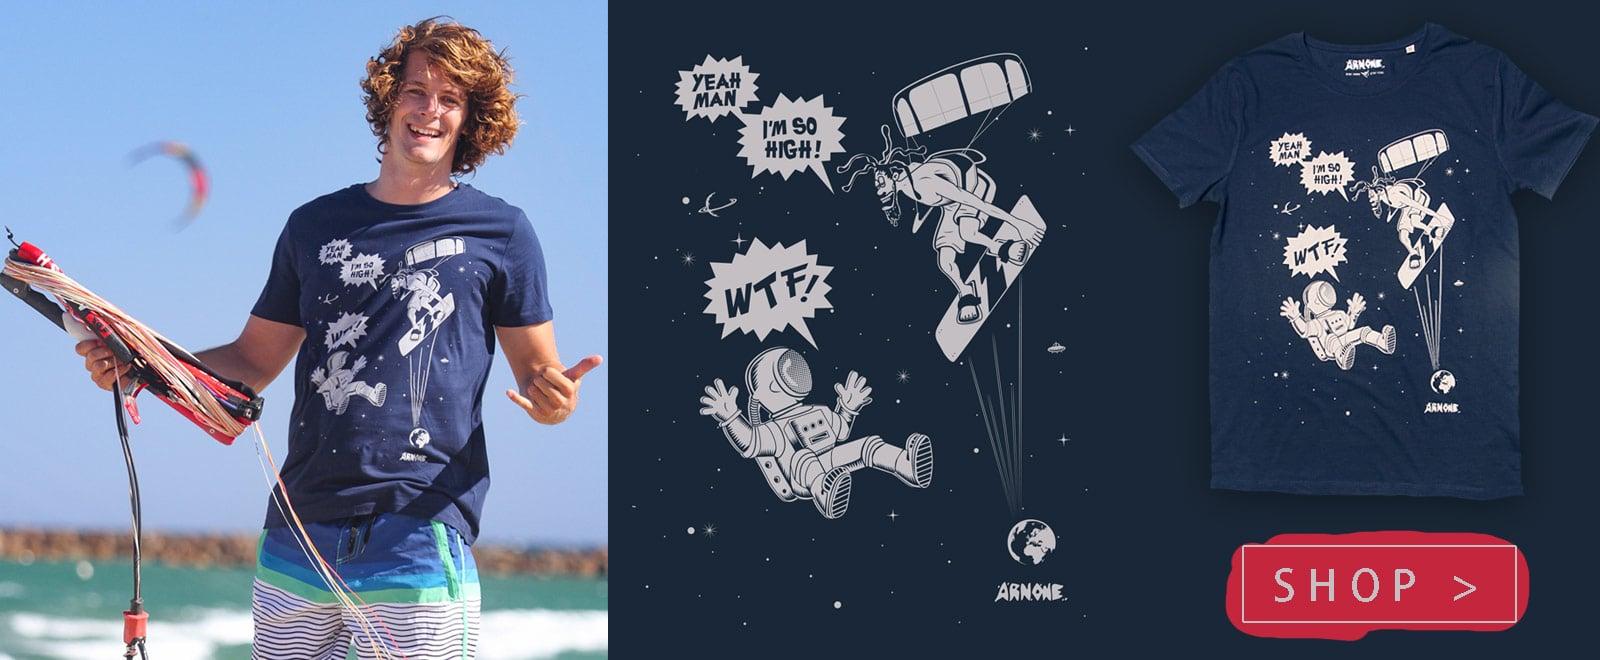 kitesurf-wear-arnone